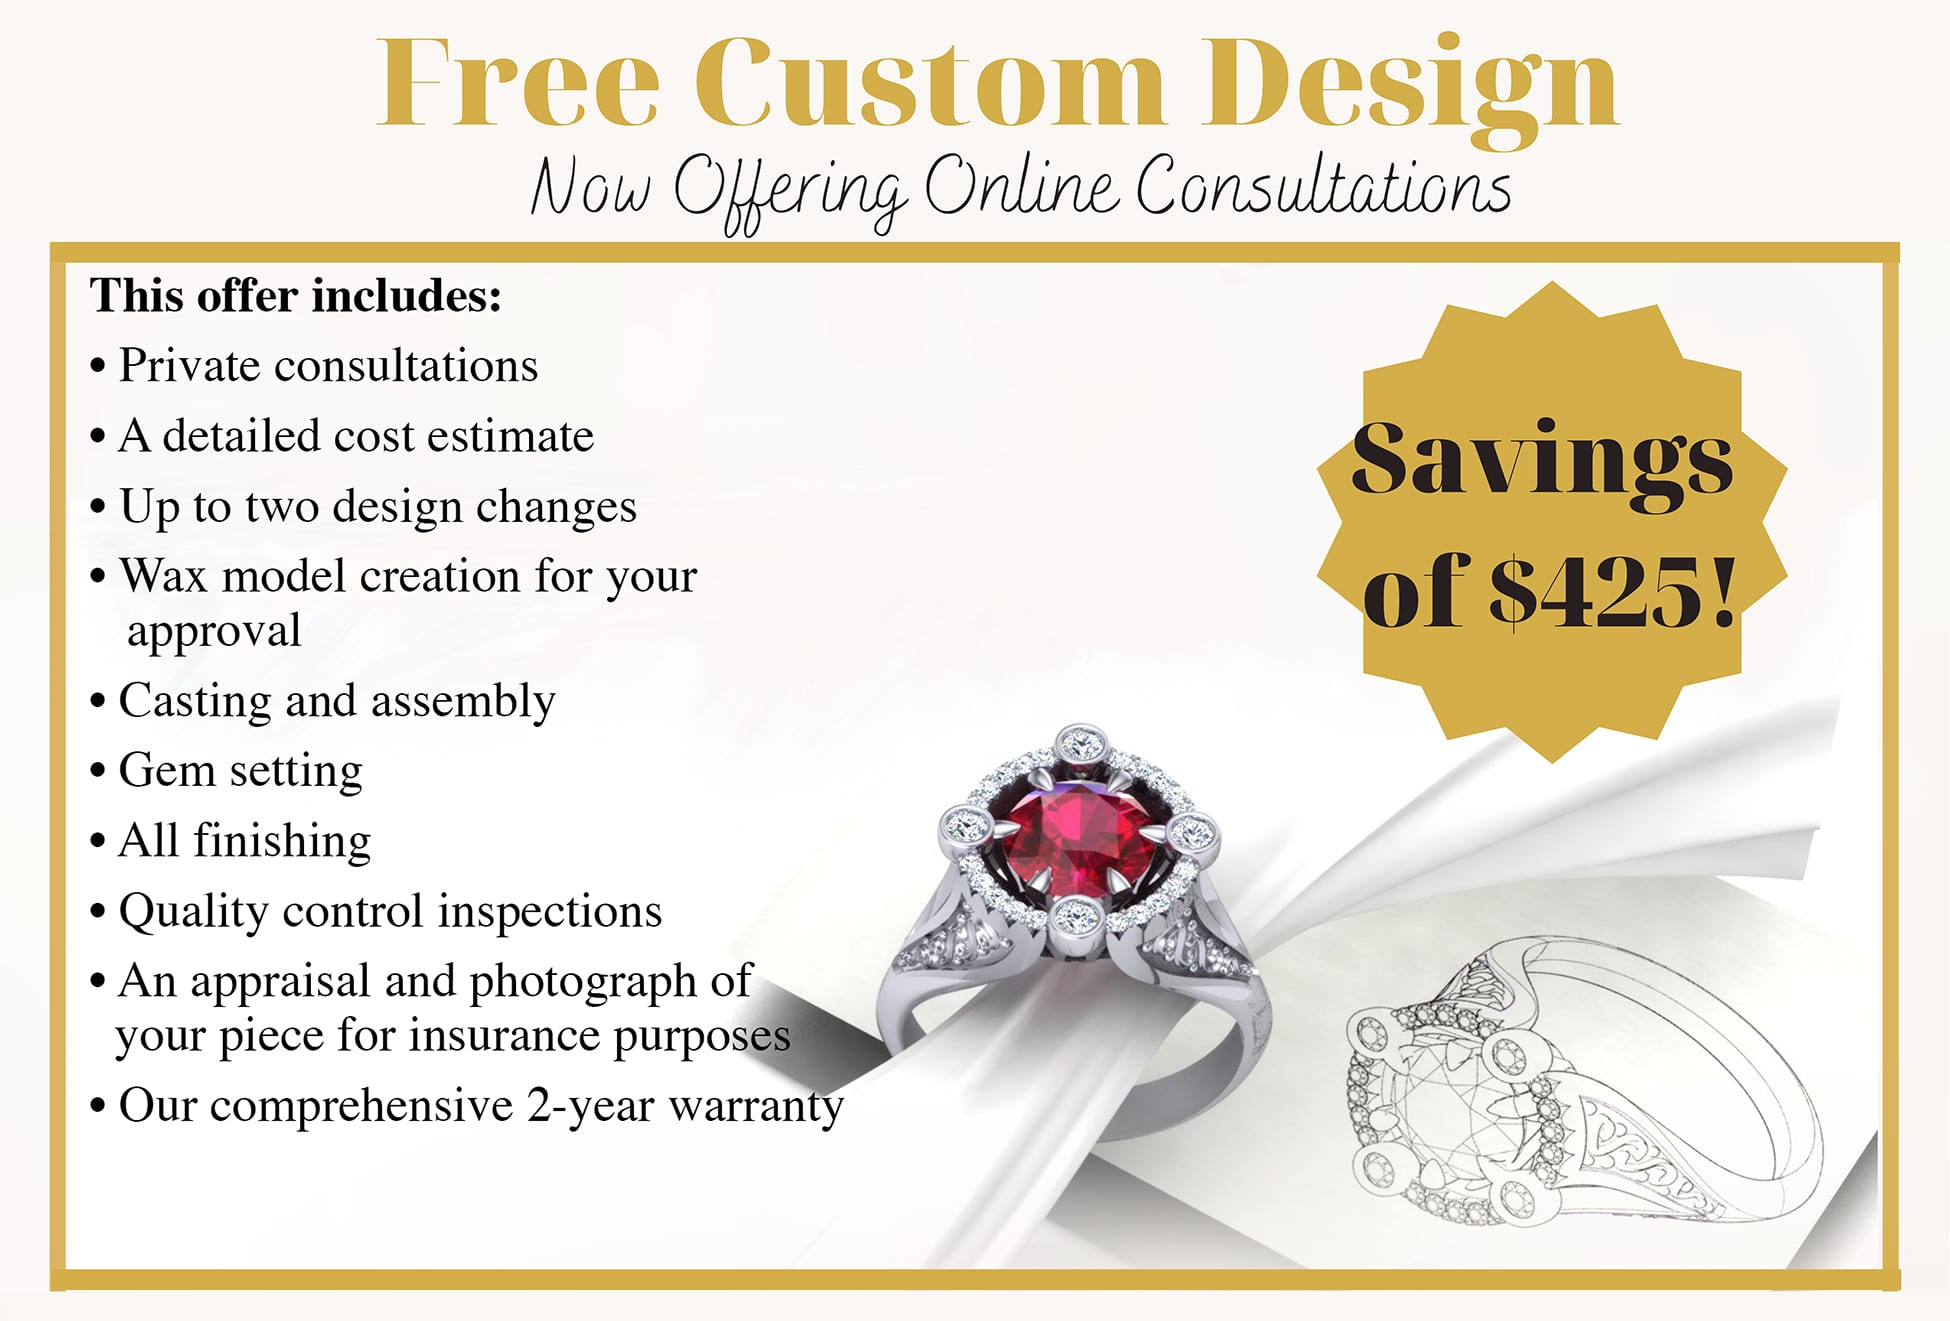 Free Custom Jewelry Design